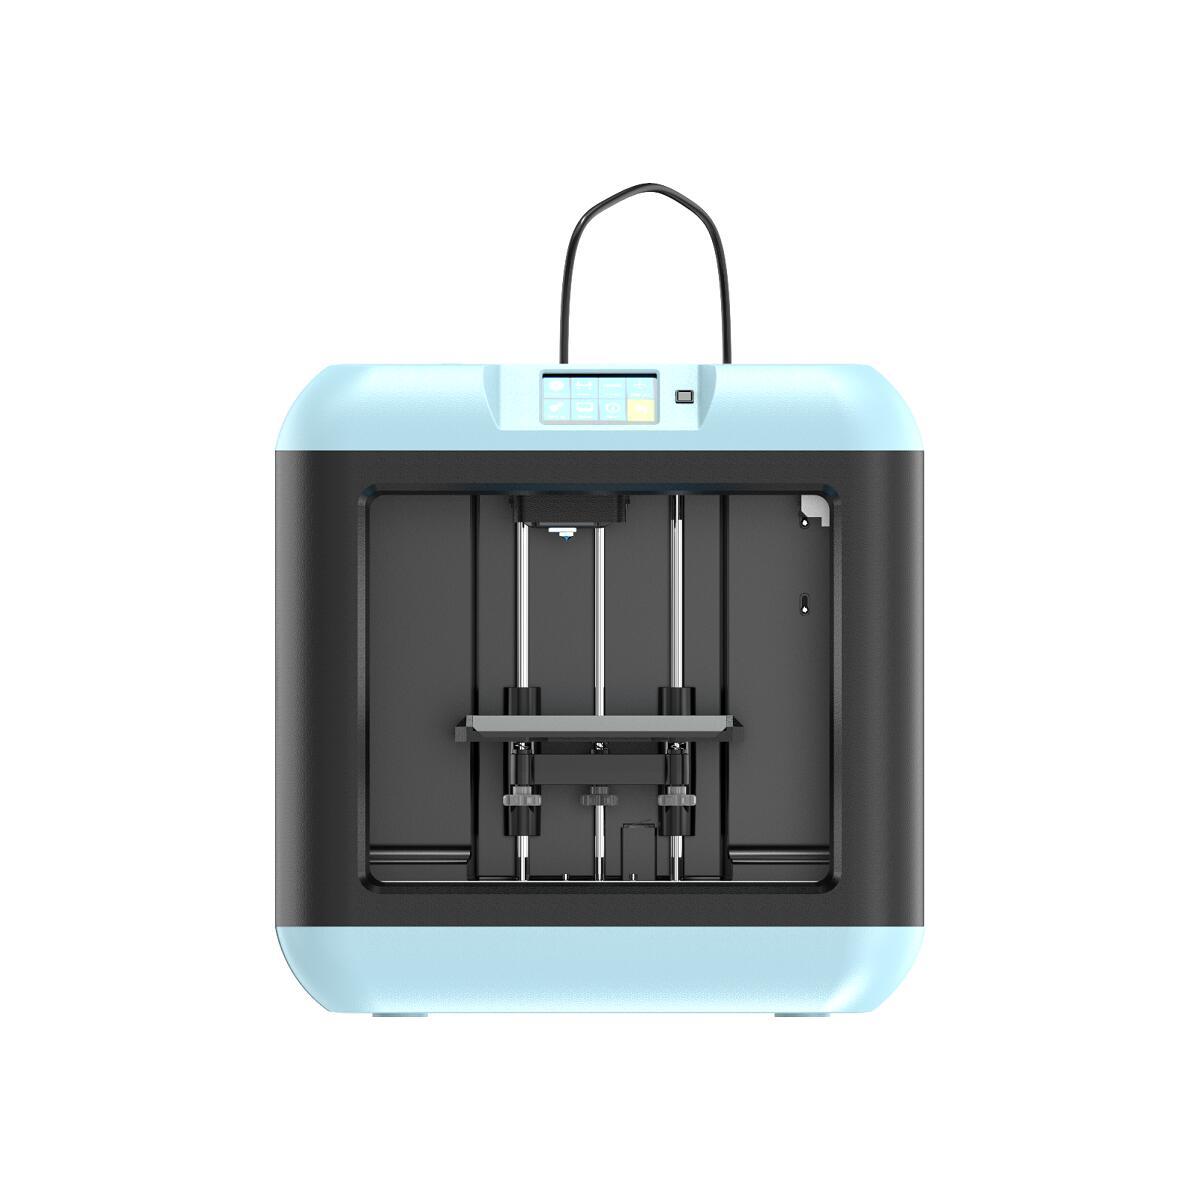 Flashforge デスクトップ 家庭用3D プリンター Finder Lite (ライトブルー) 送料無料